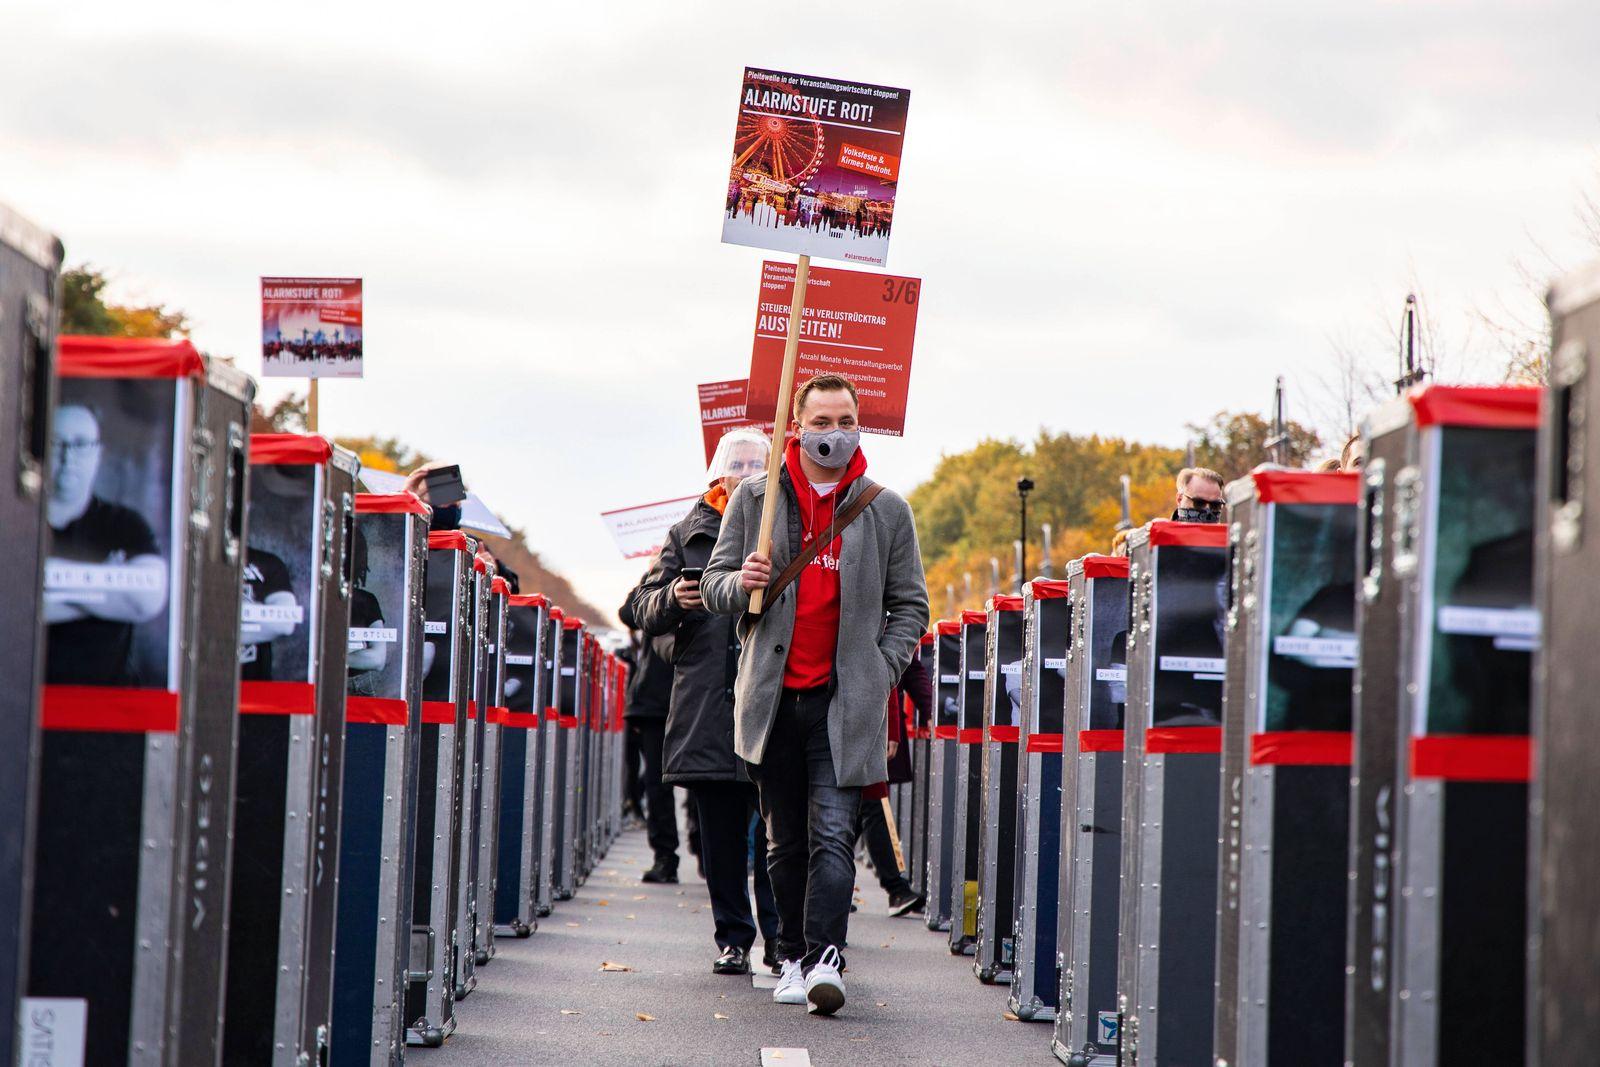 Demonstration Alarmstufe Rot der Veranstaltungsbranche in Berlin am 28.Oktober 2020. Demonstration der Veranstaltungsbr